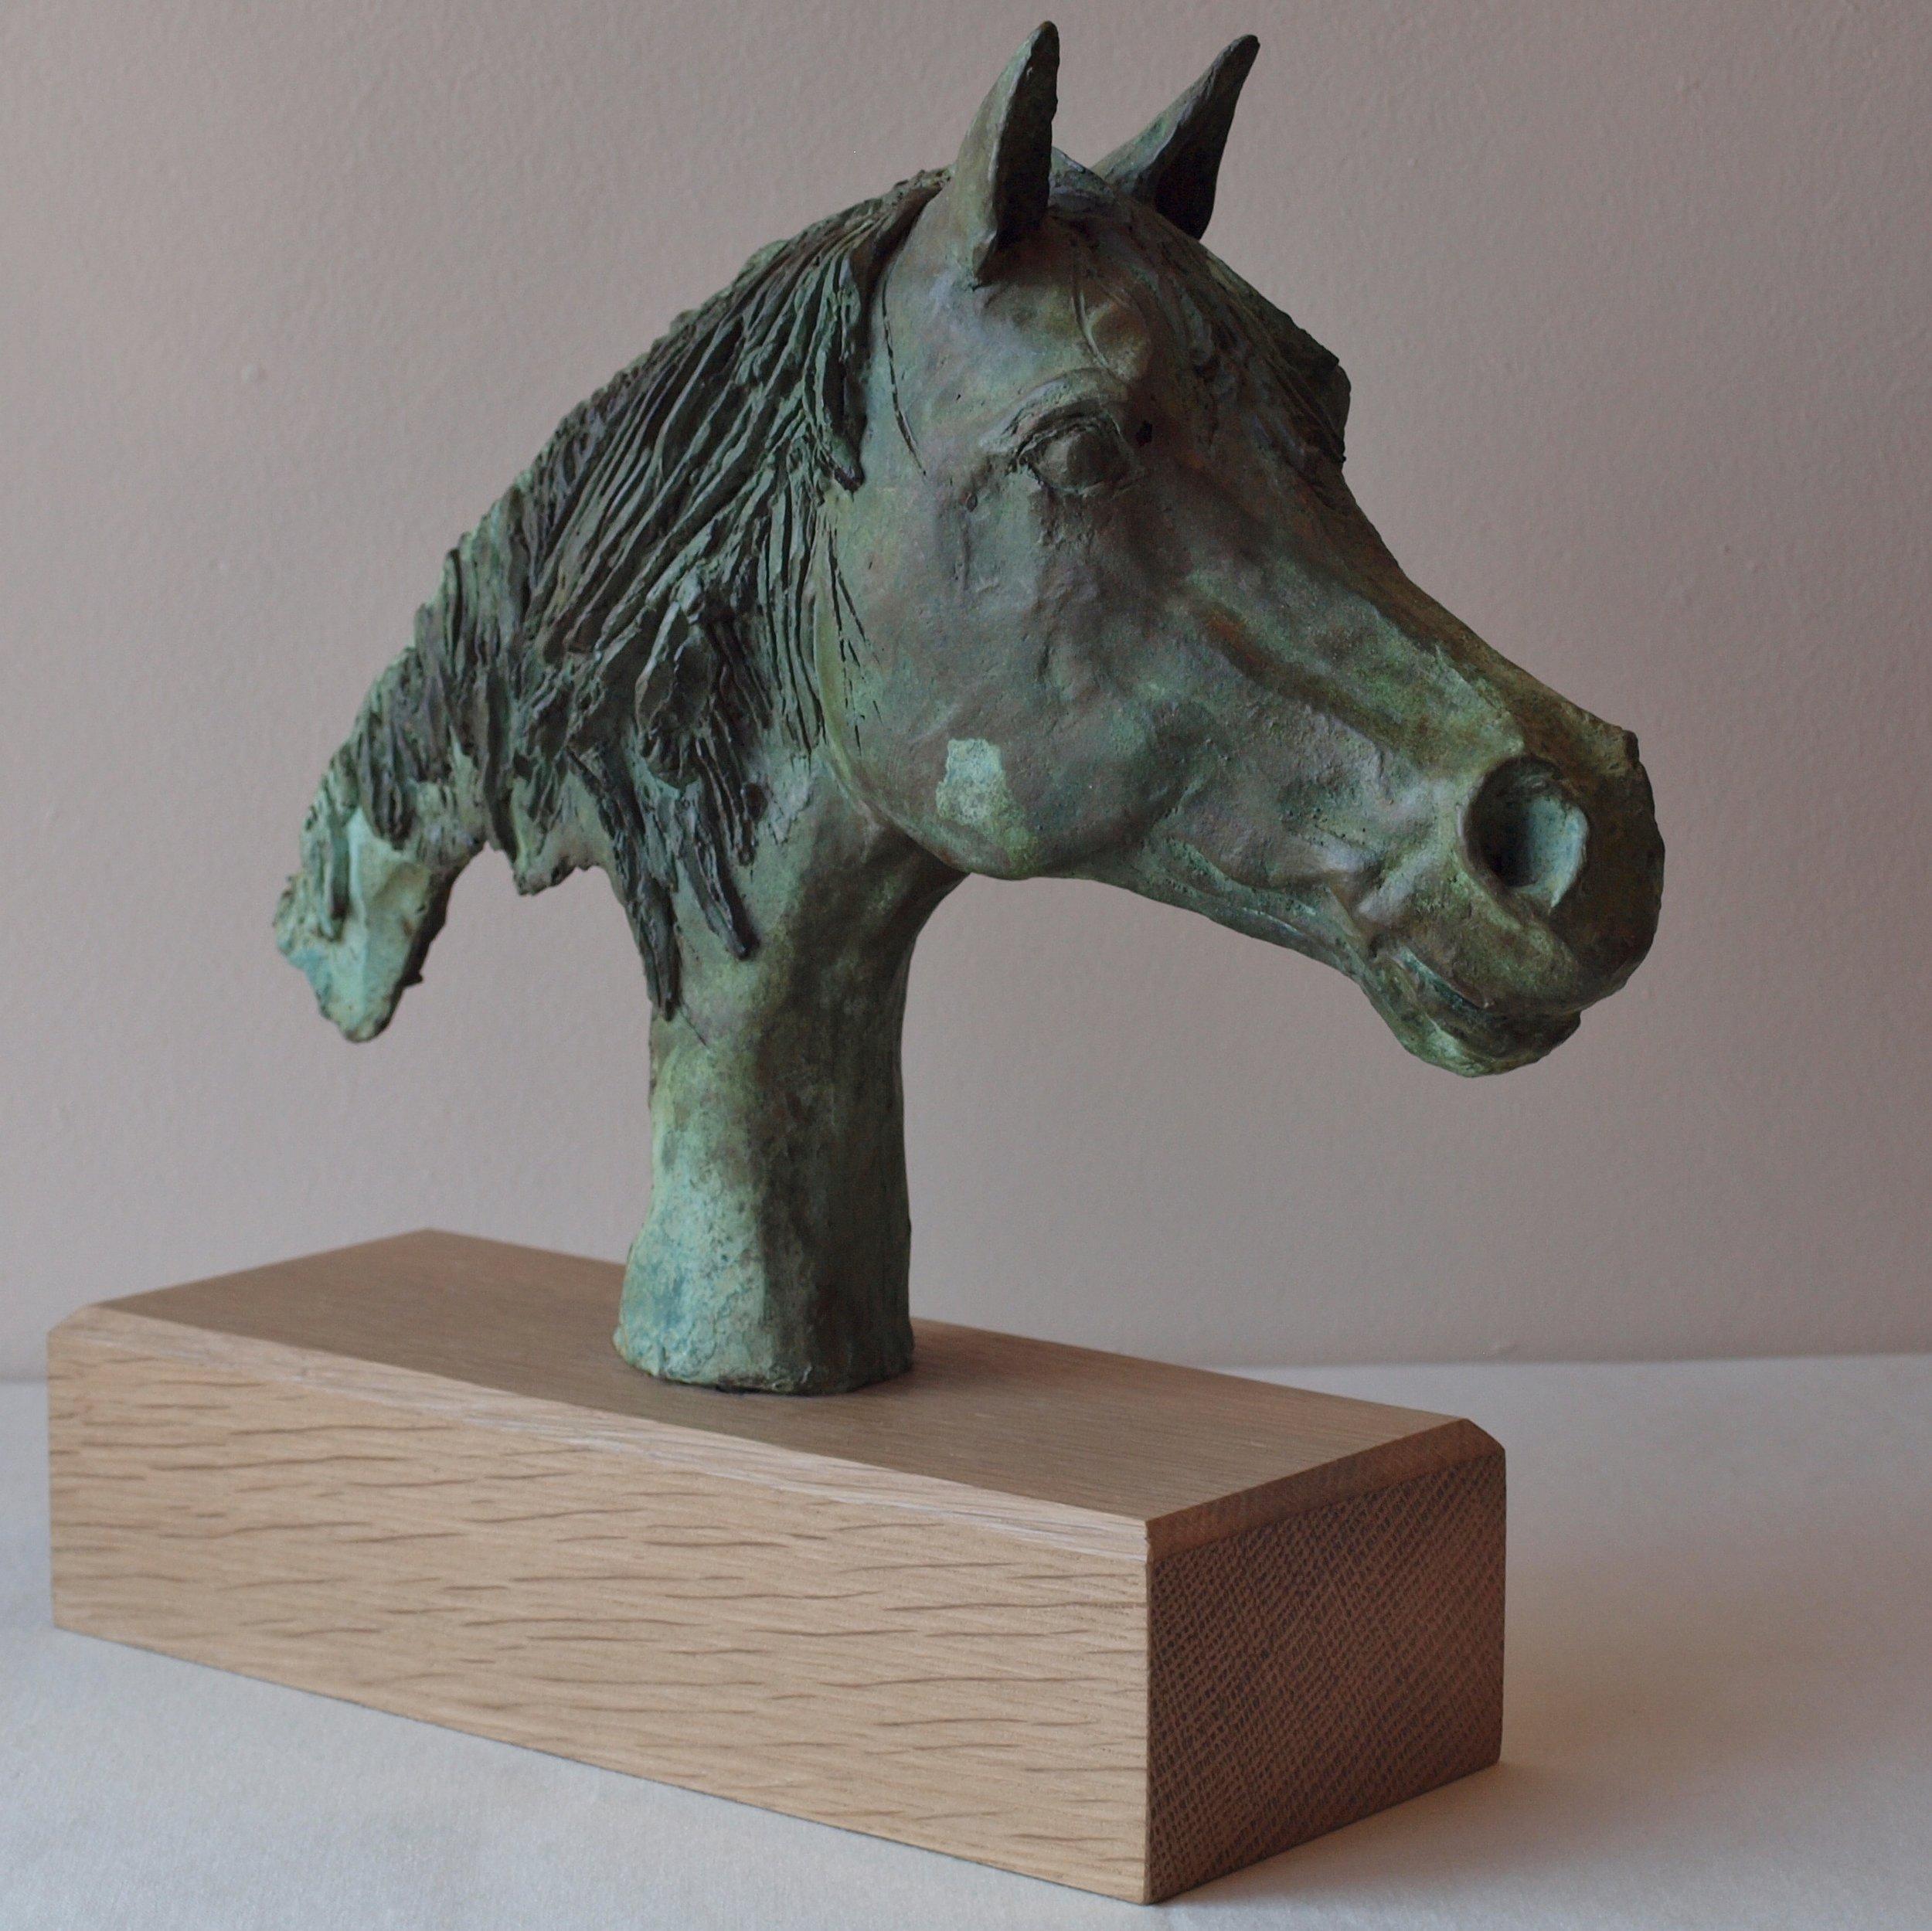 Silvern Surprise - 2019 (cold cast bronze)